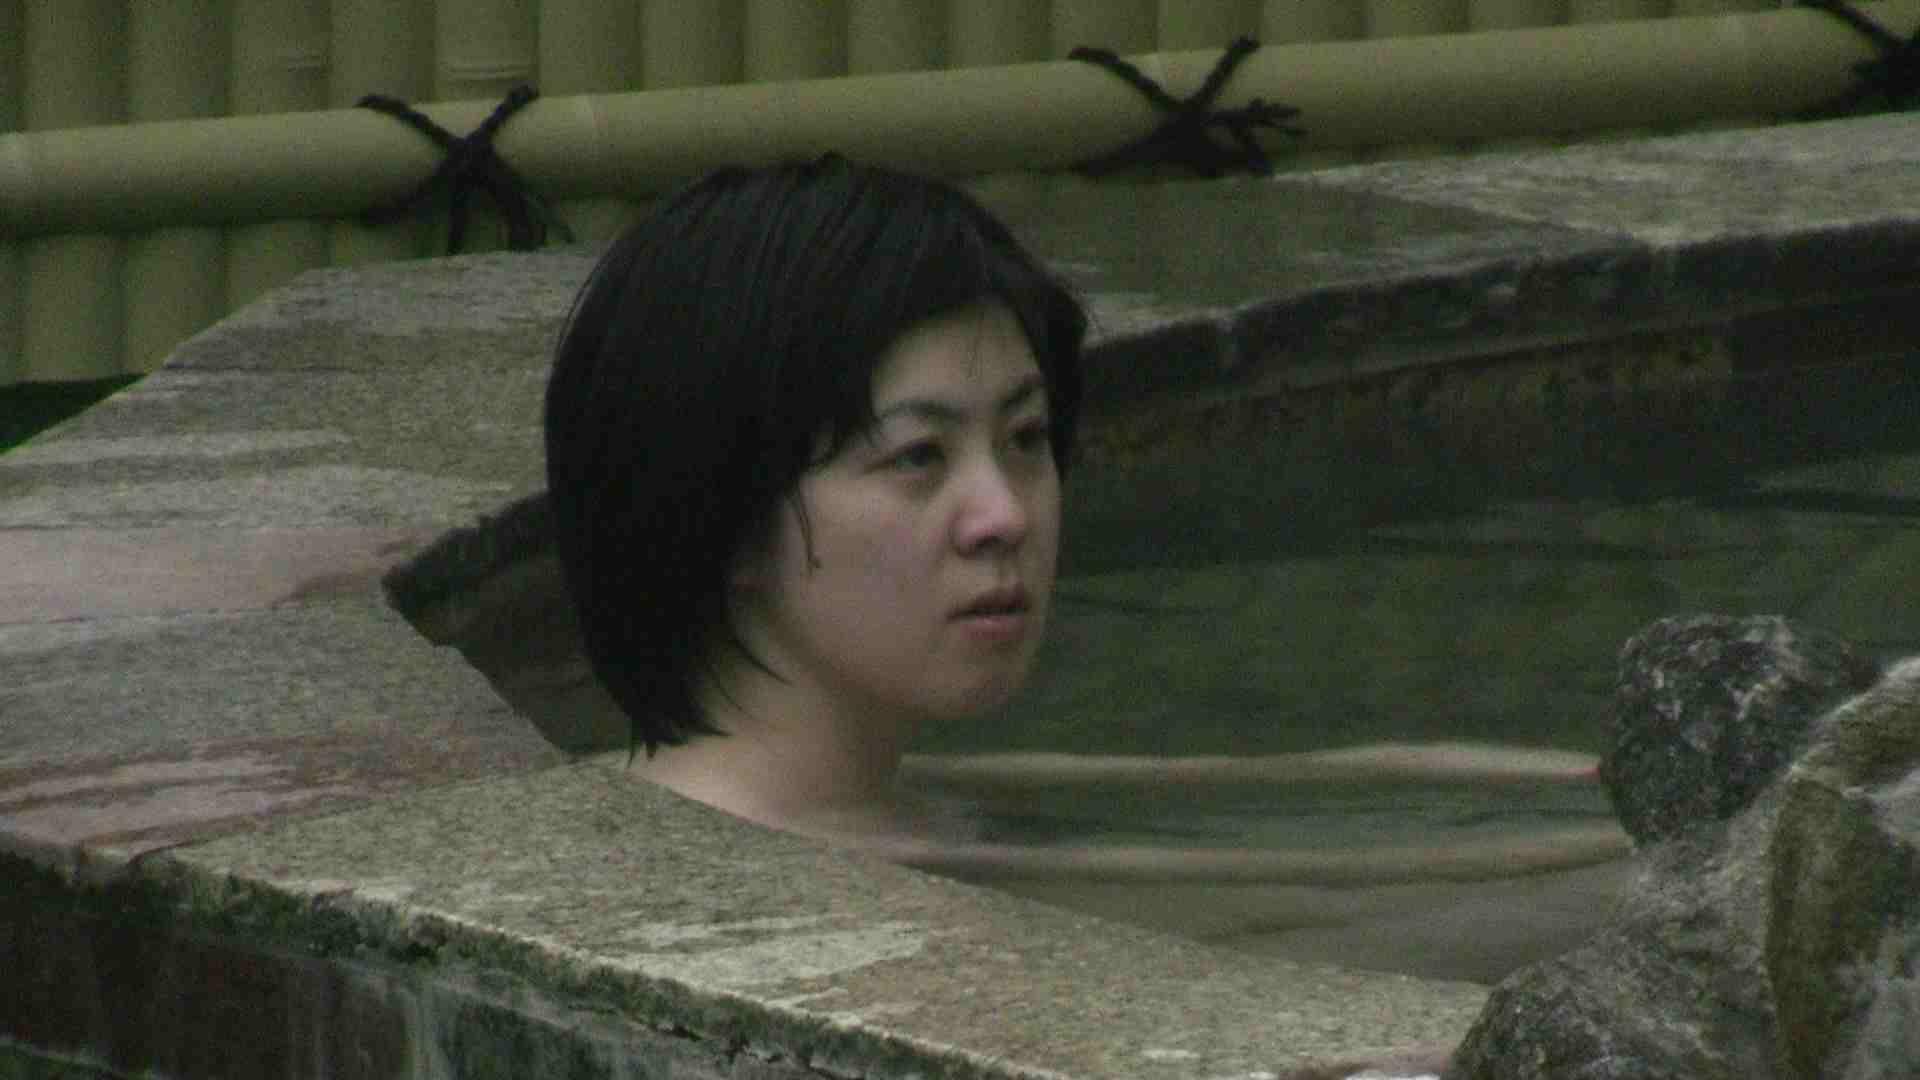 Aquaな露天風呂Vol.685 盗撮シリーズ | 露天風呂編  95PIX 85